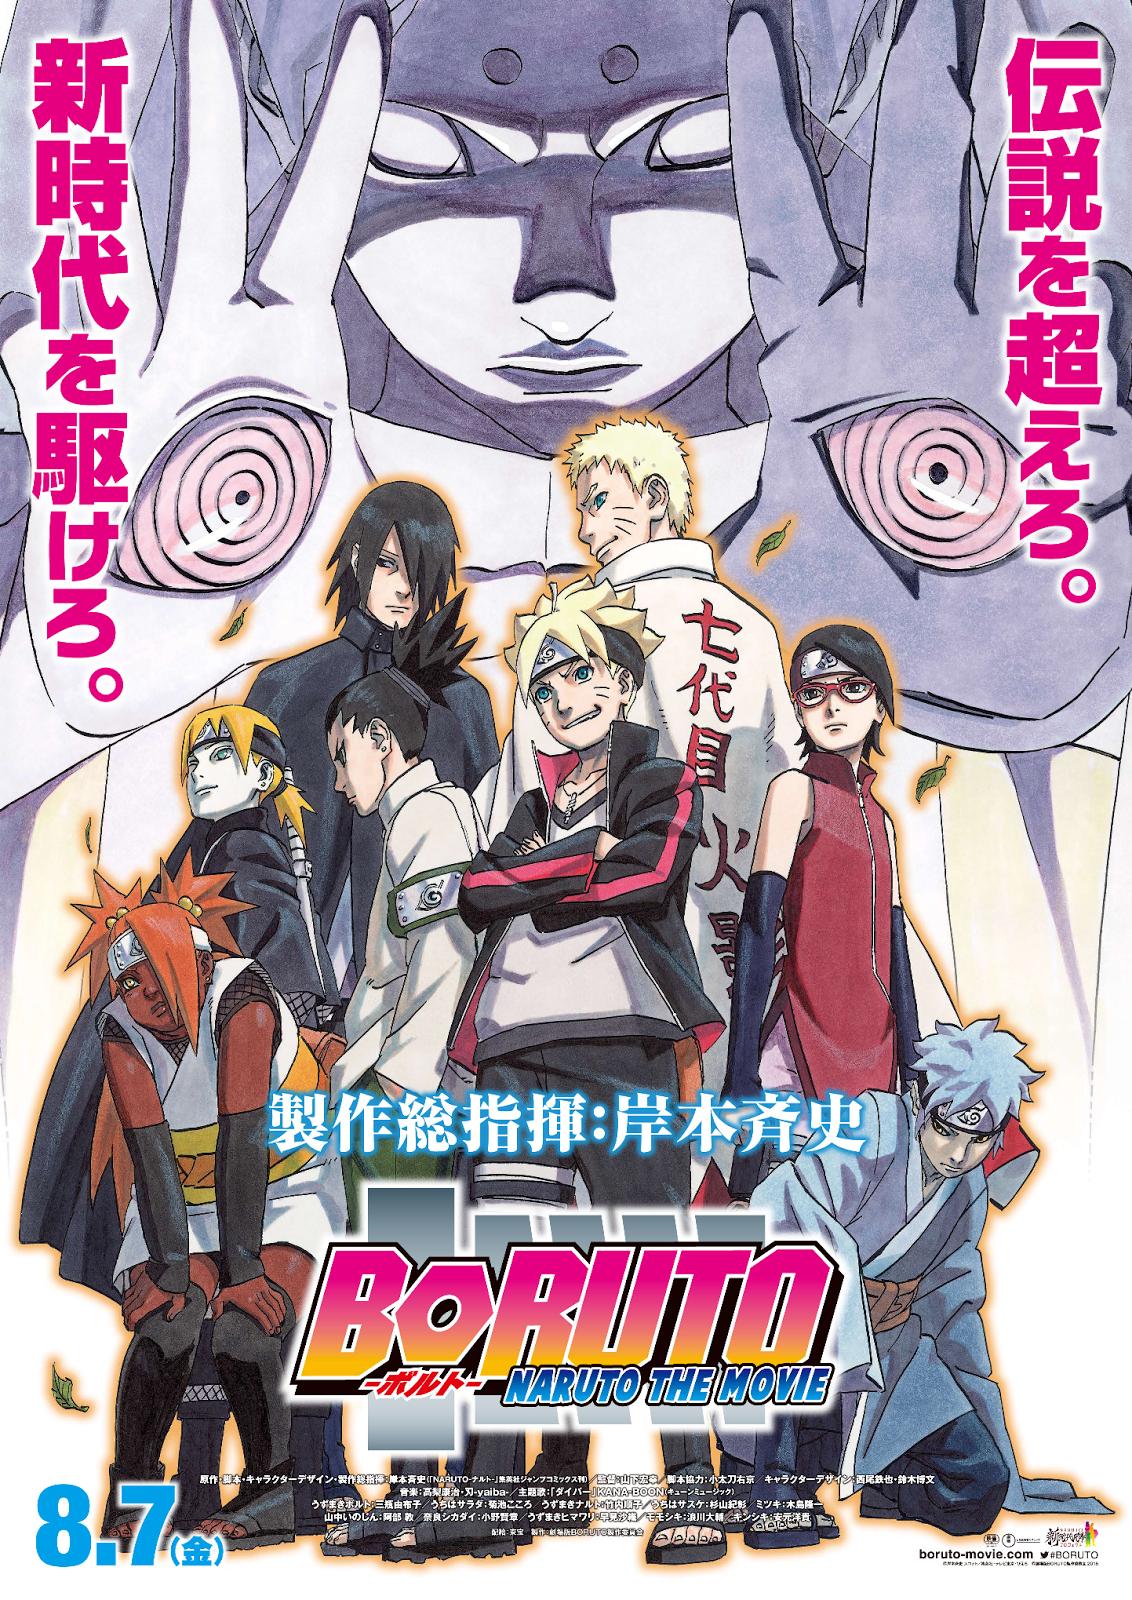 Nonton Boruto : Naruto Next Generations Episode 7 sub indo